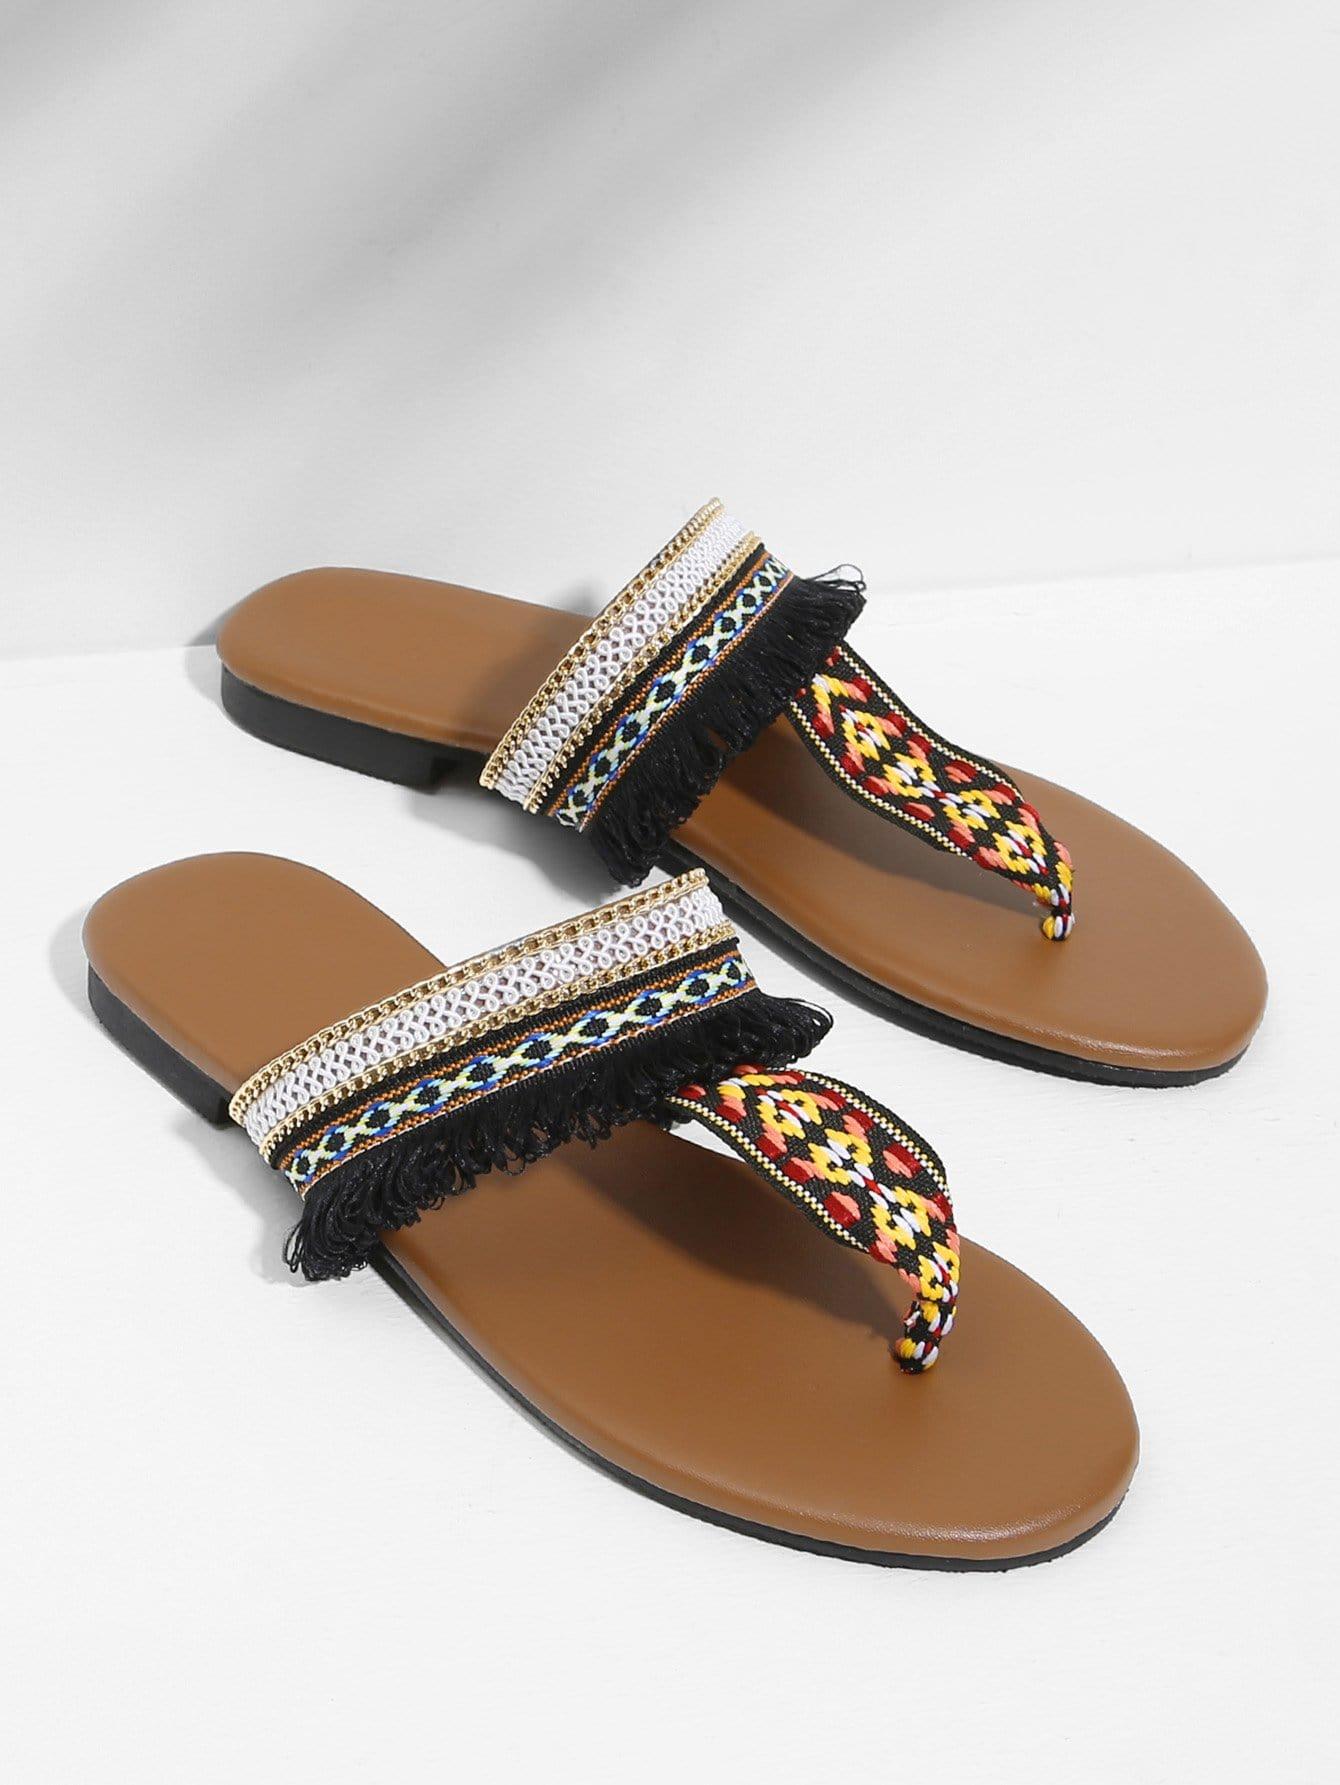 Toe Post Flat Sandals rose decorated toe post flat sandals